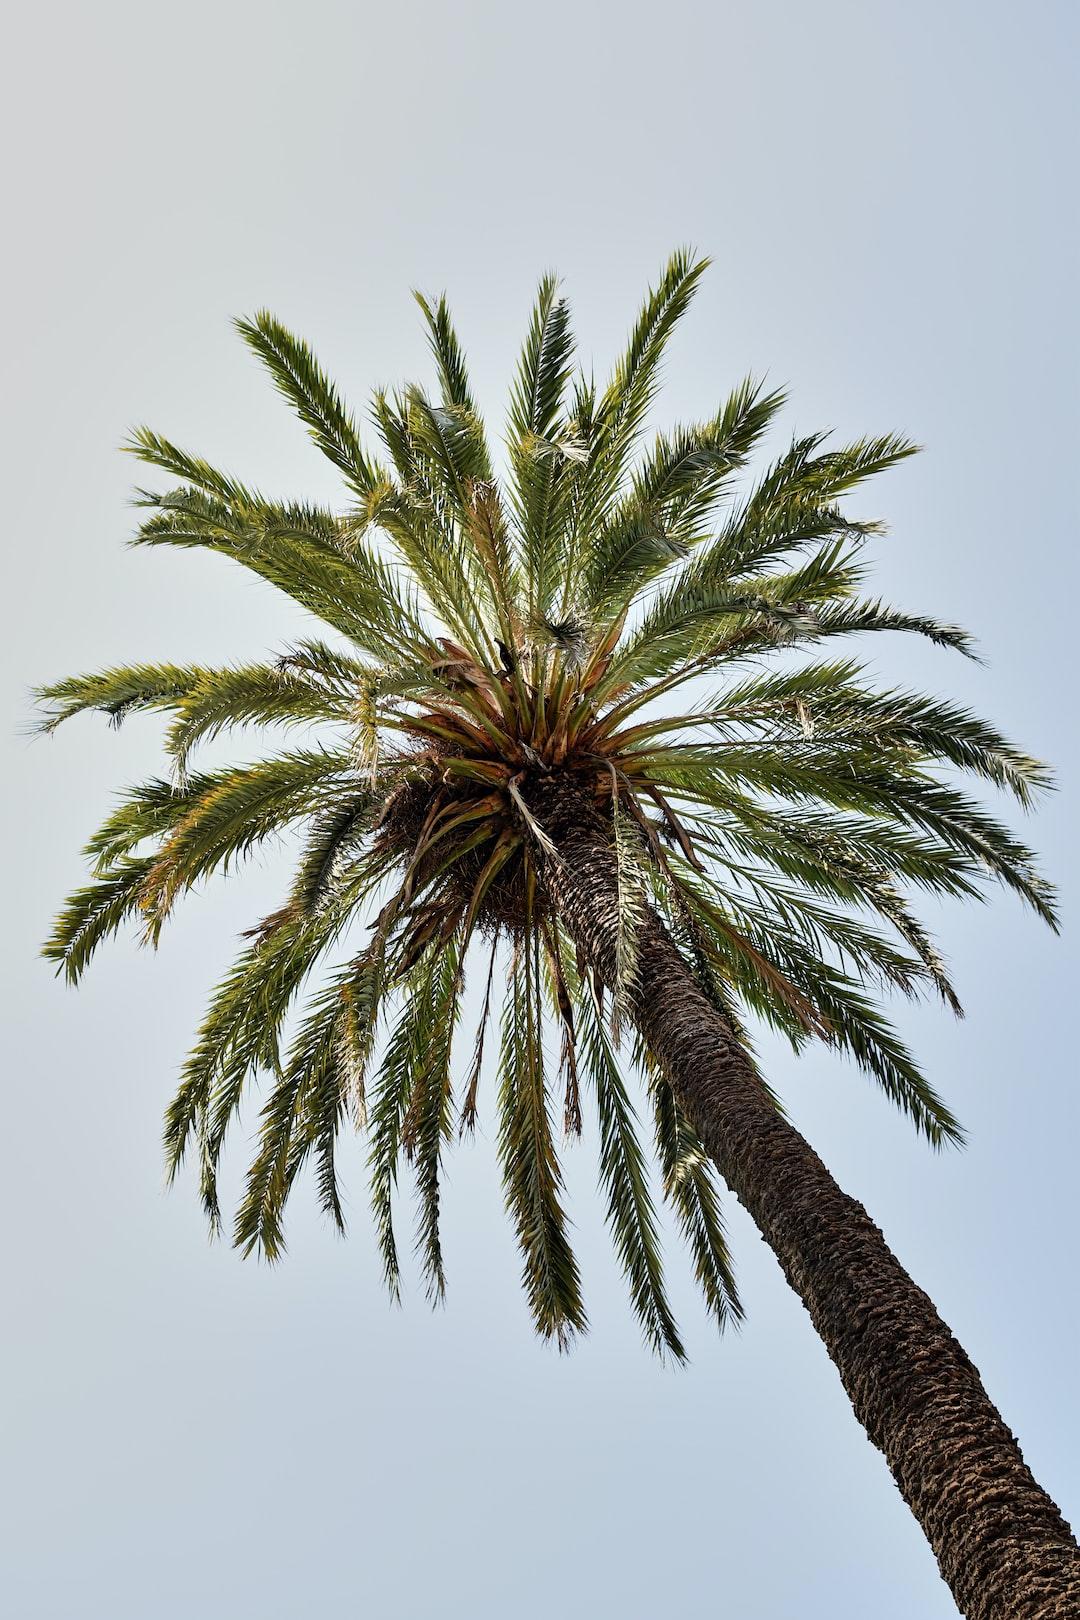 Centro de Palma de Mallorca, Parque de la Catedral, verano.